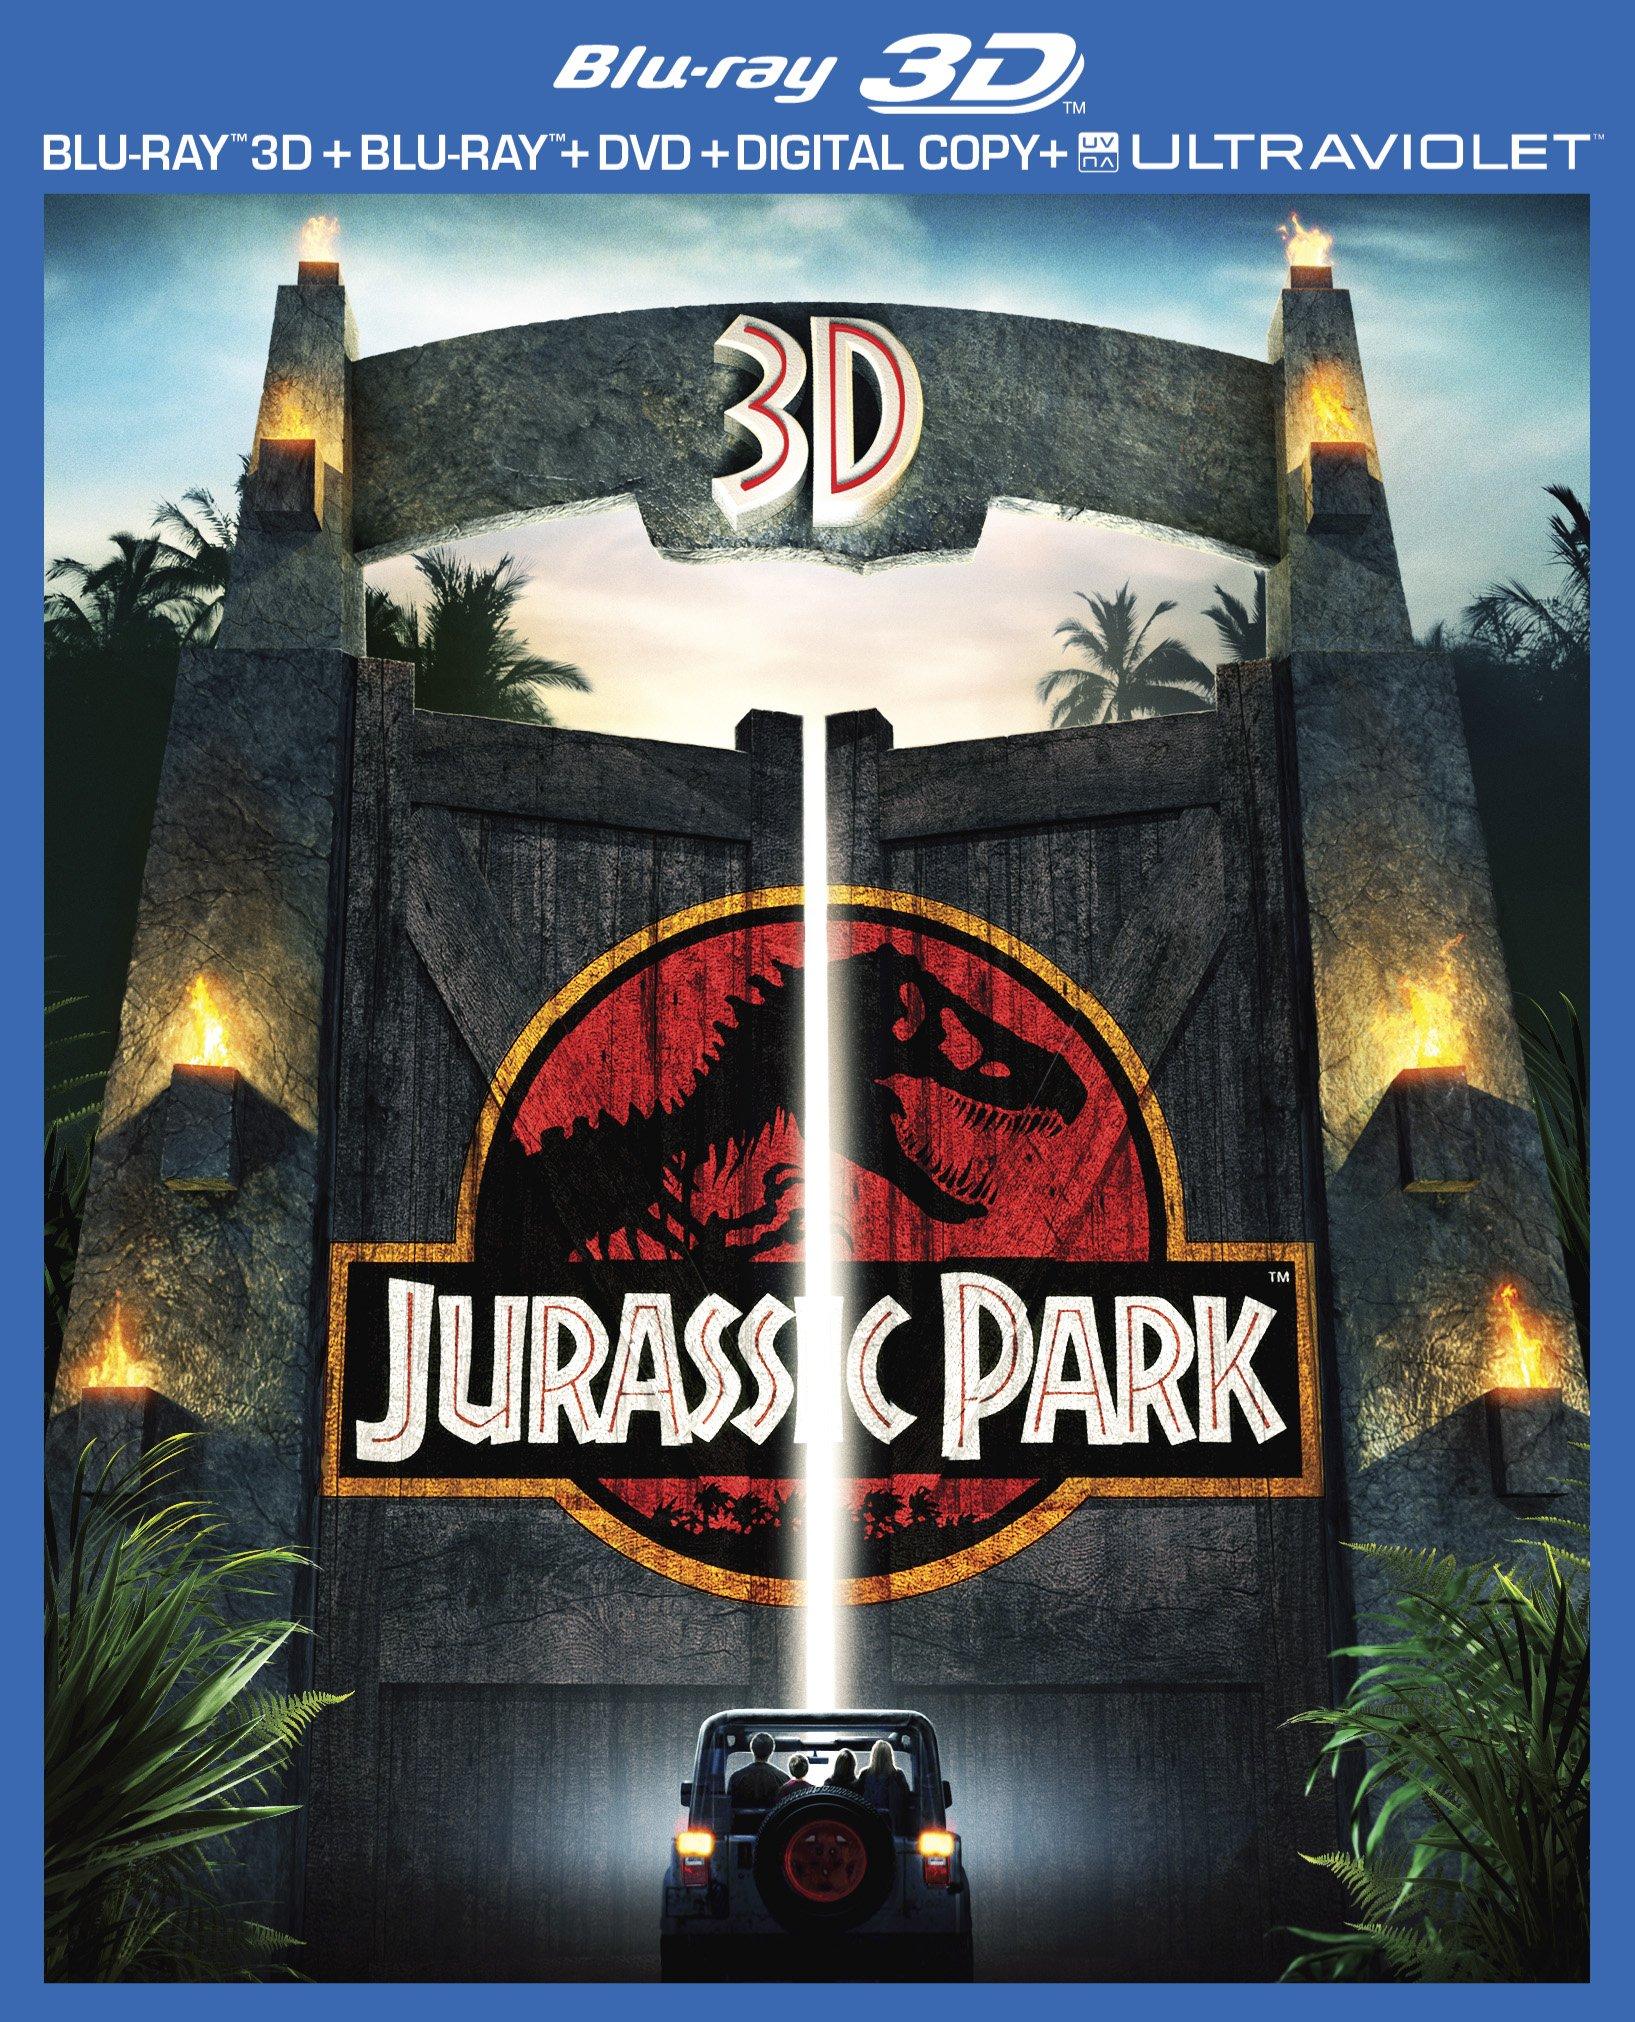 Blu-ray 3D : Jurassic Park (With DVD, Ultraviolet Digital Copy, Digital Copy, 3 Pack, 3 Dimensional)